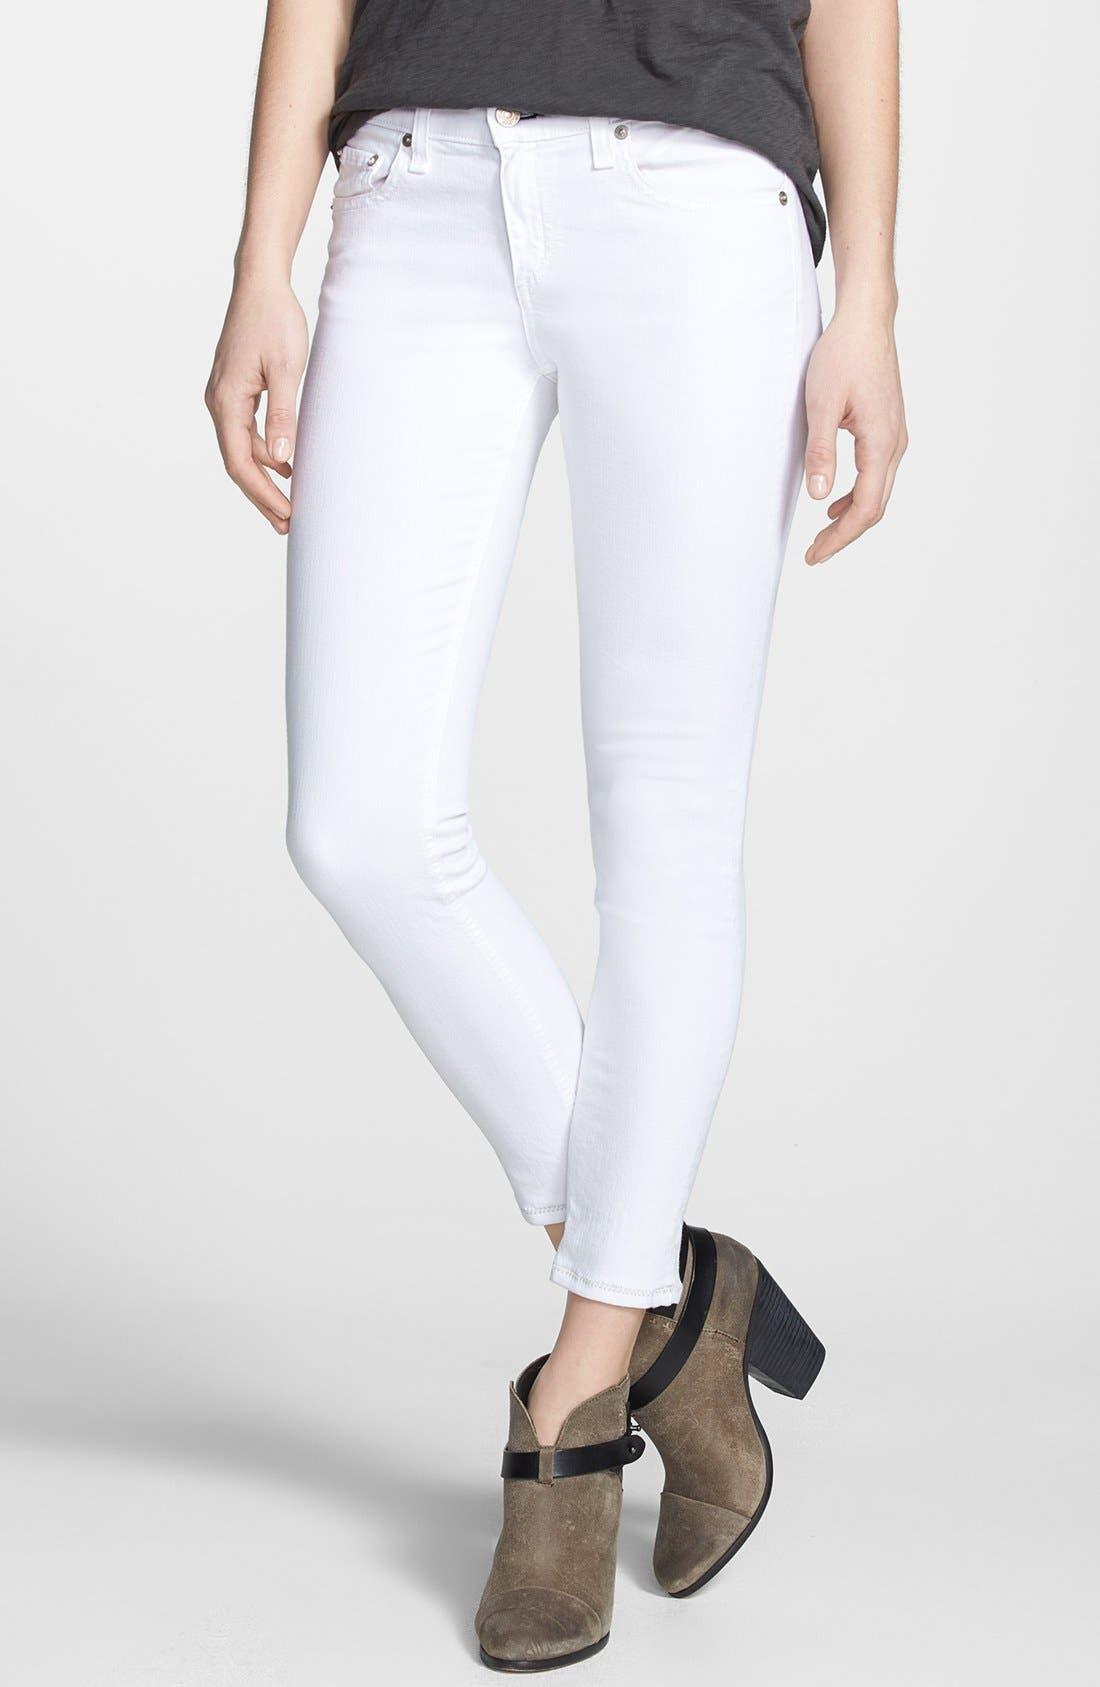 Alternate Image 1 Selected - rag & bone/JEAN 'Repair' Skinny Crop Jeans (Bright White)